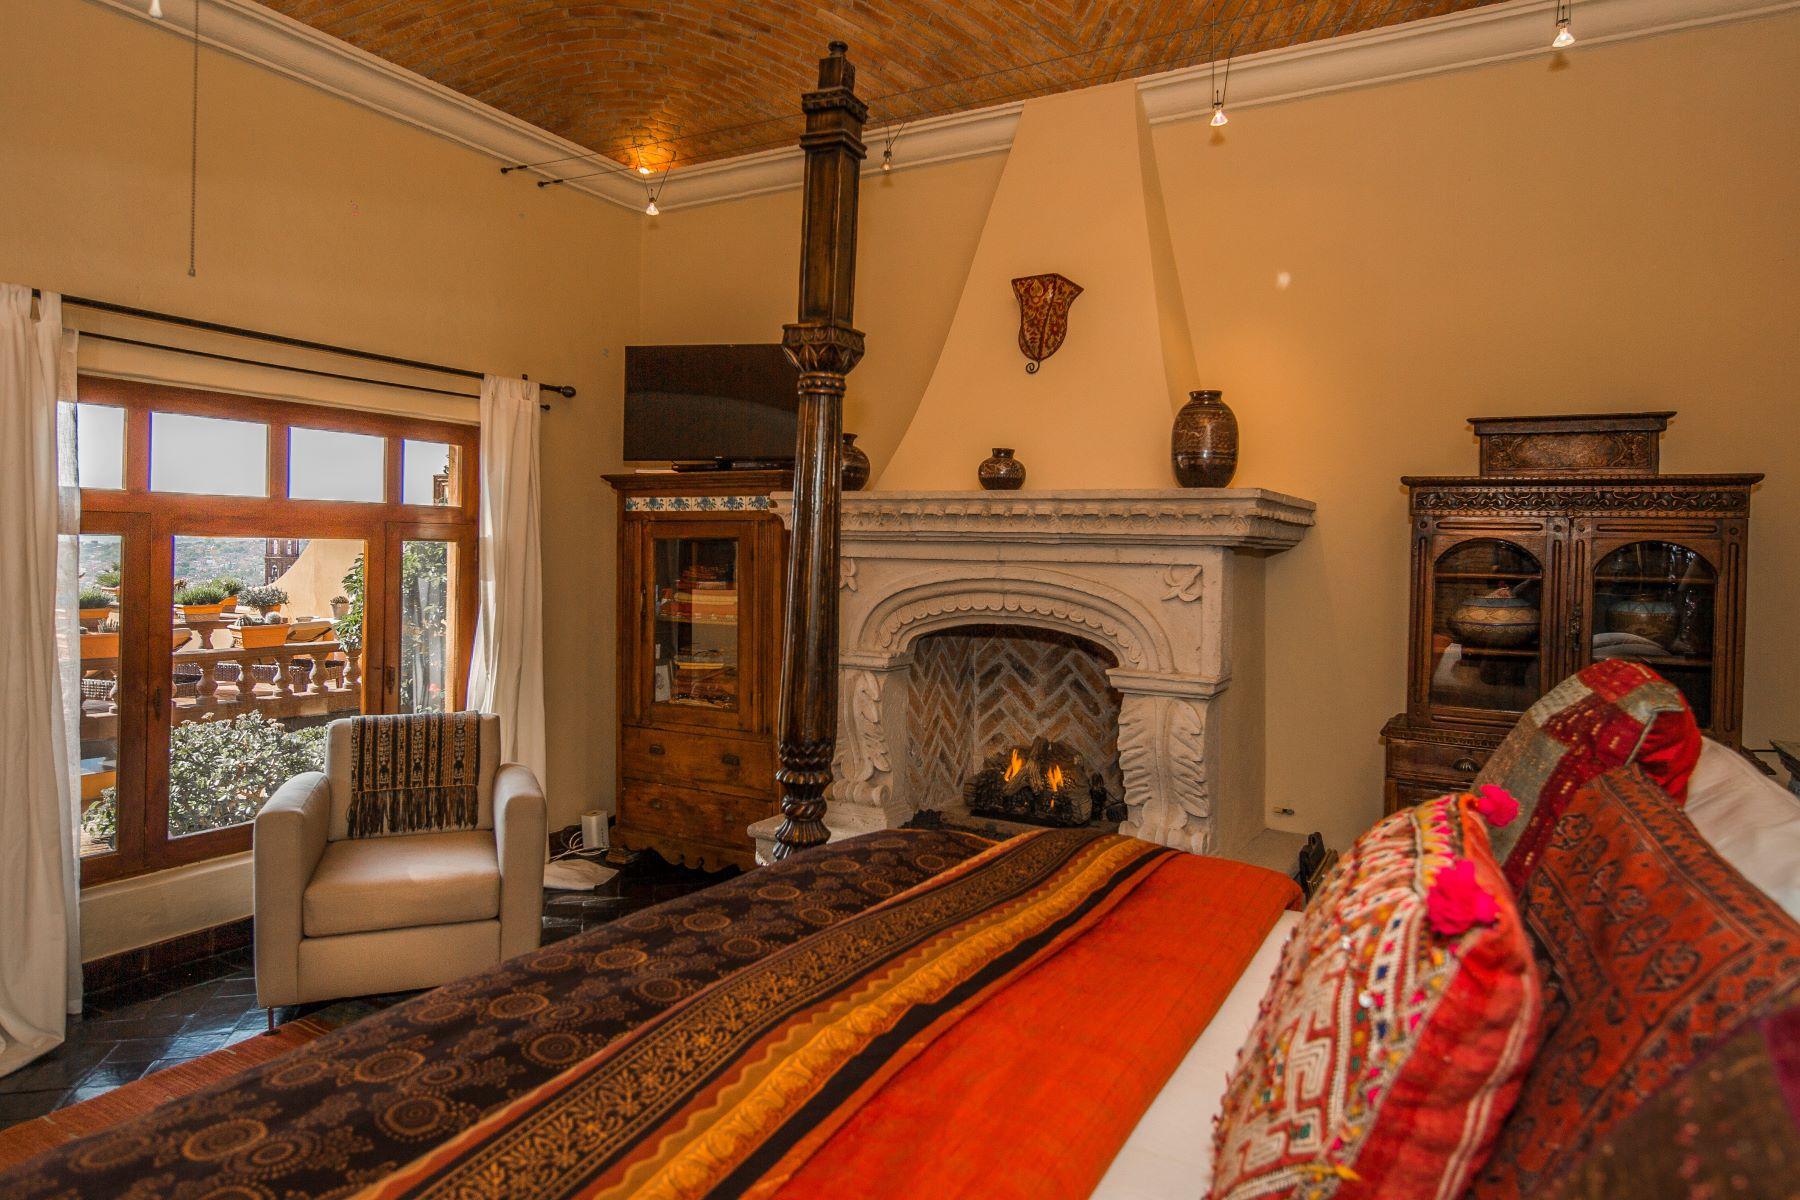 Additional photo for property listing at Casa Barranca Barranca 18 San Miguel De Allende, Guanajuato 37700 Mexico